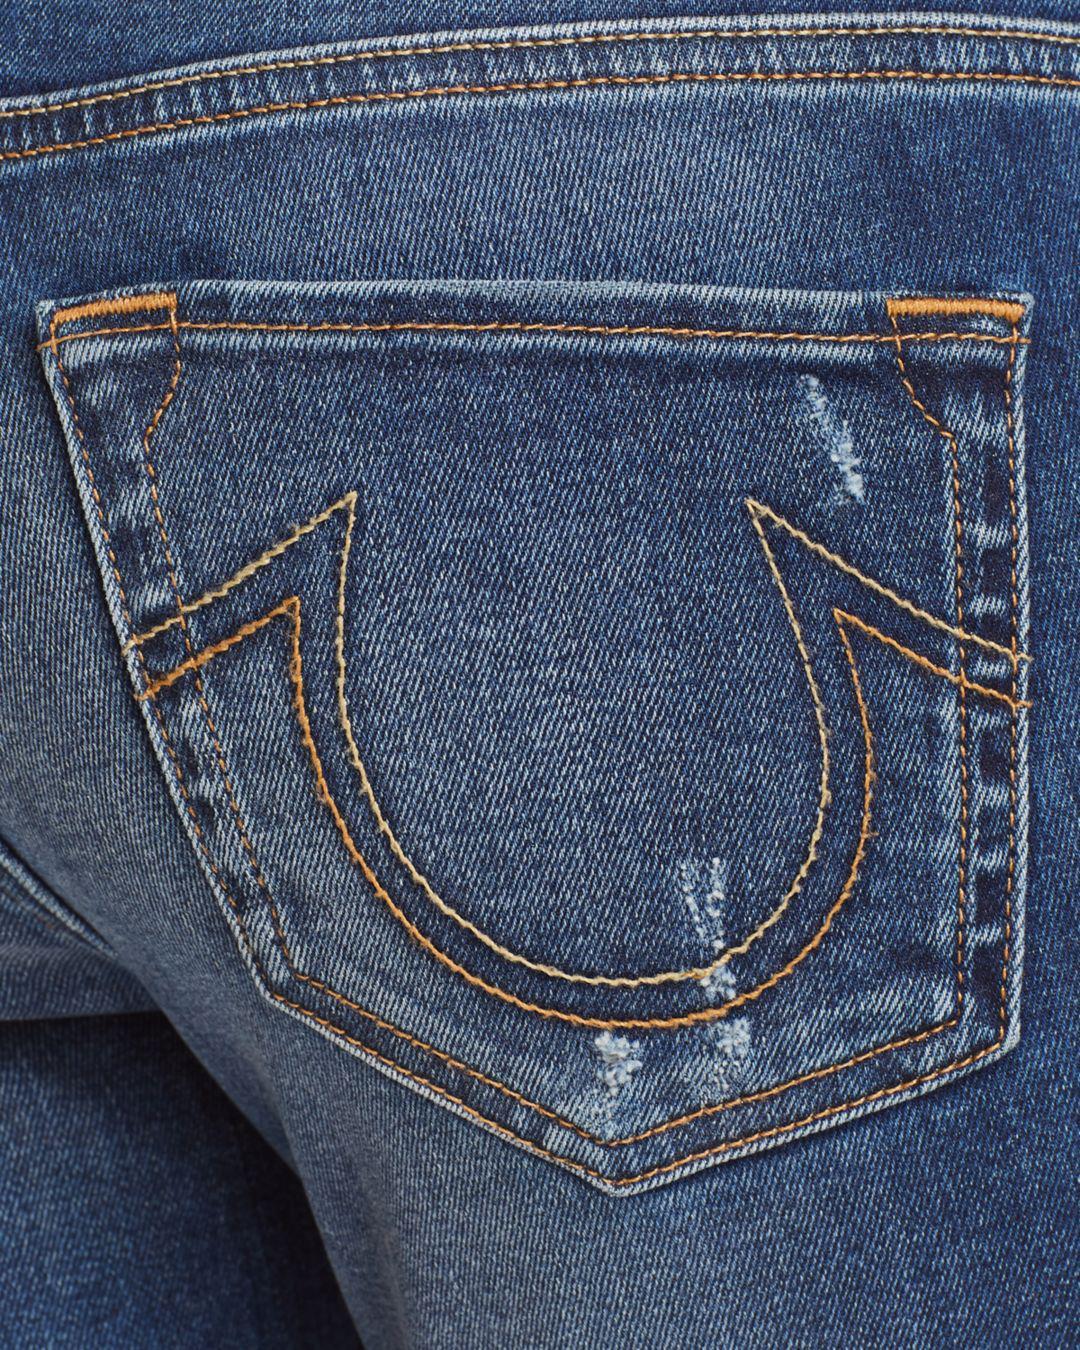 True Religion Denim Halle Mid Rise Super Skinny Jeans In Broken Night in Blue